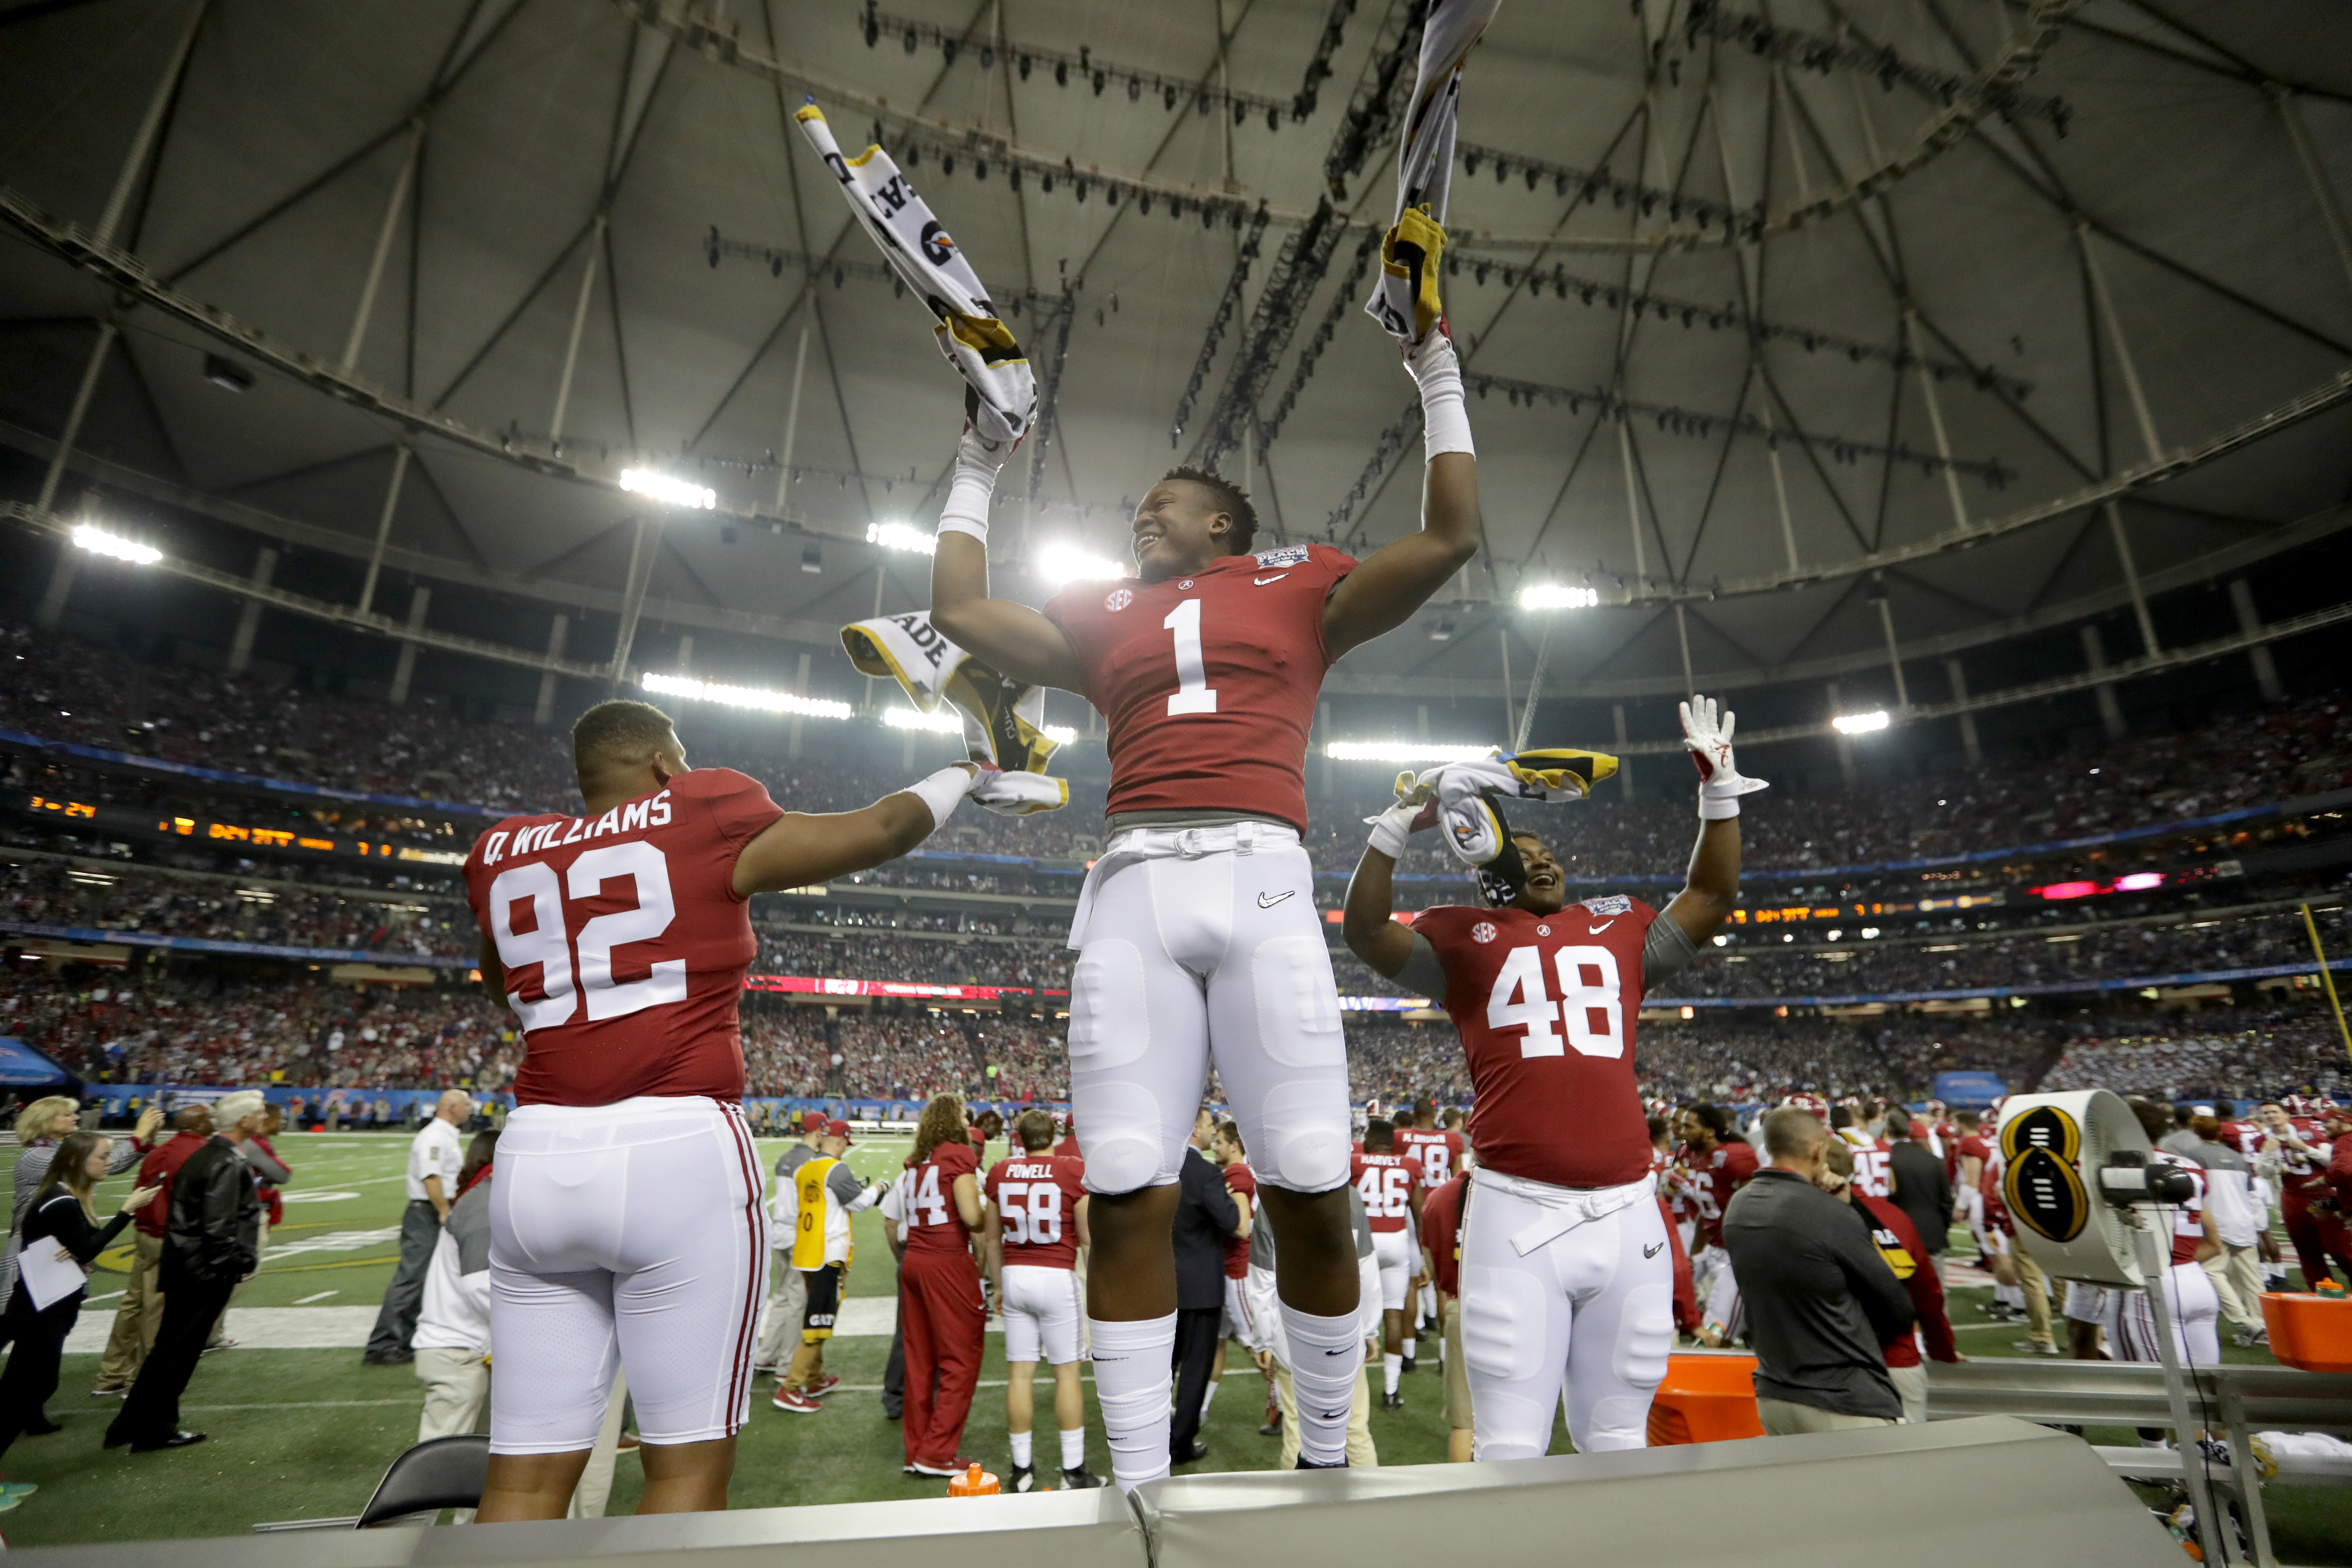 Alabama players refuse to shake hands with Washington players